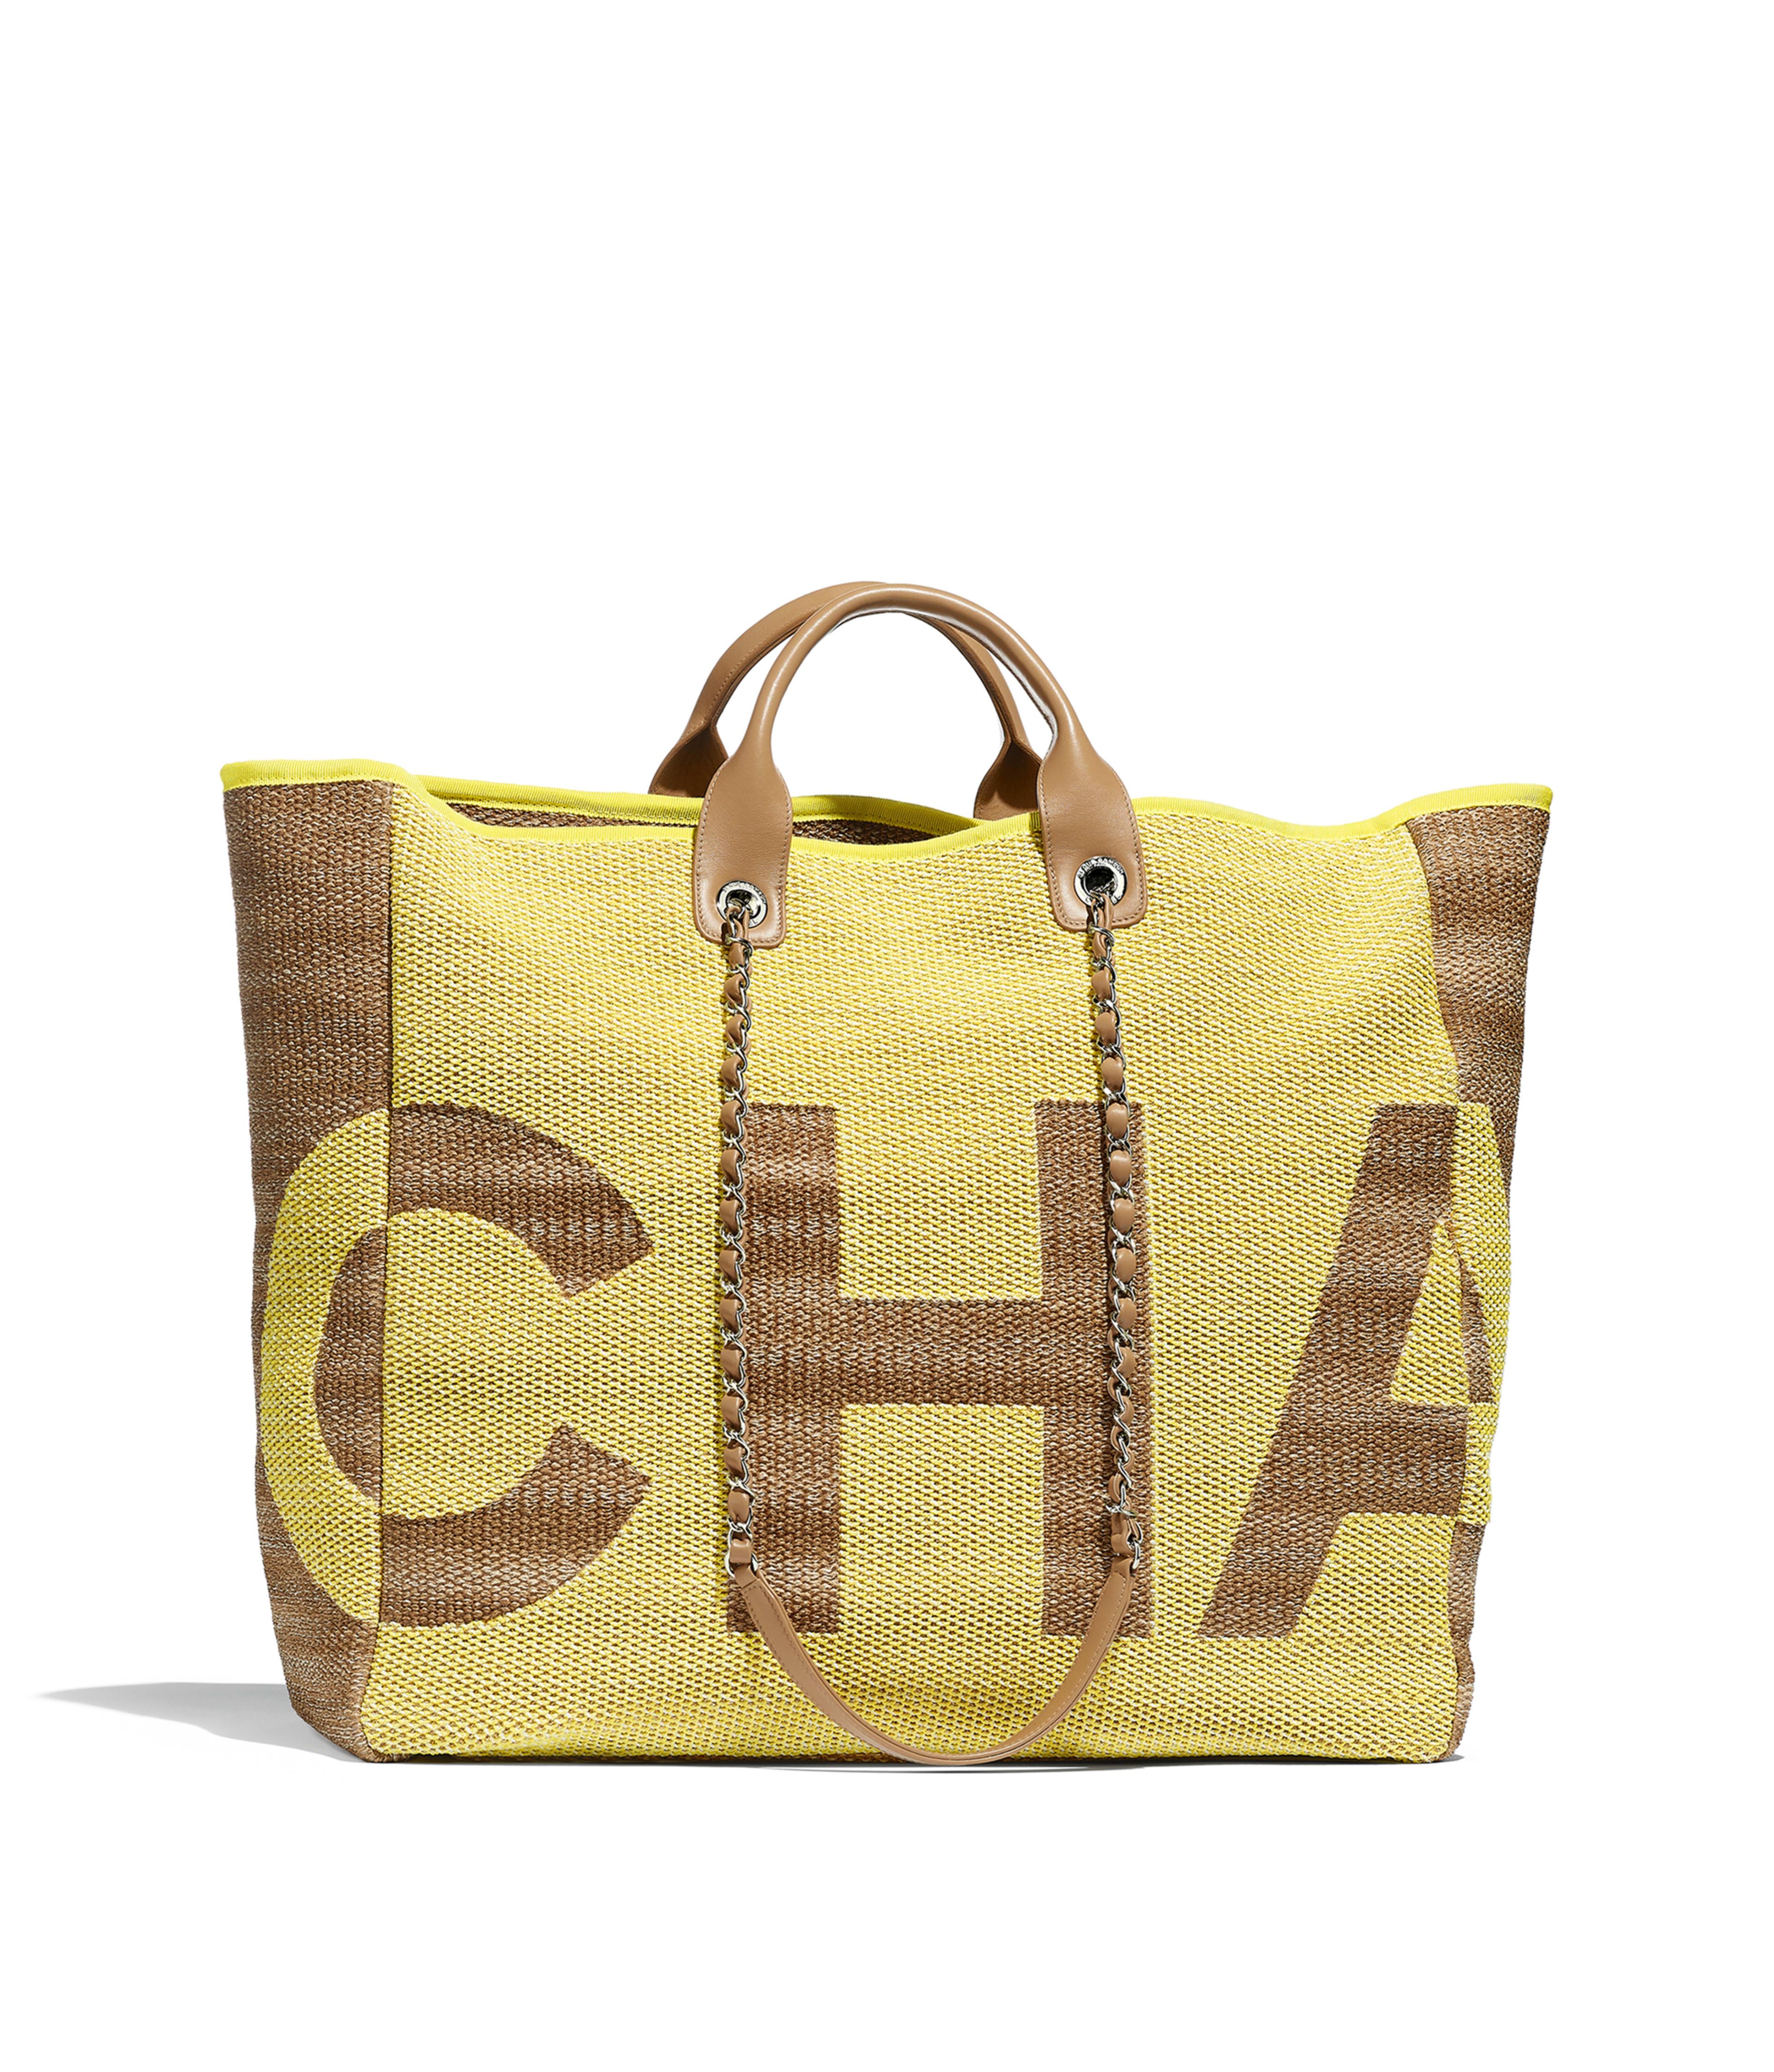 b403478b3f40 Large Shopping Bag Mixed Fibers, Viscose, Calfskin & Silver-Tone Metal,  Yellow & Dark Beige Ref. A57162B00380N4525